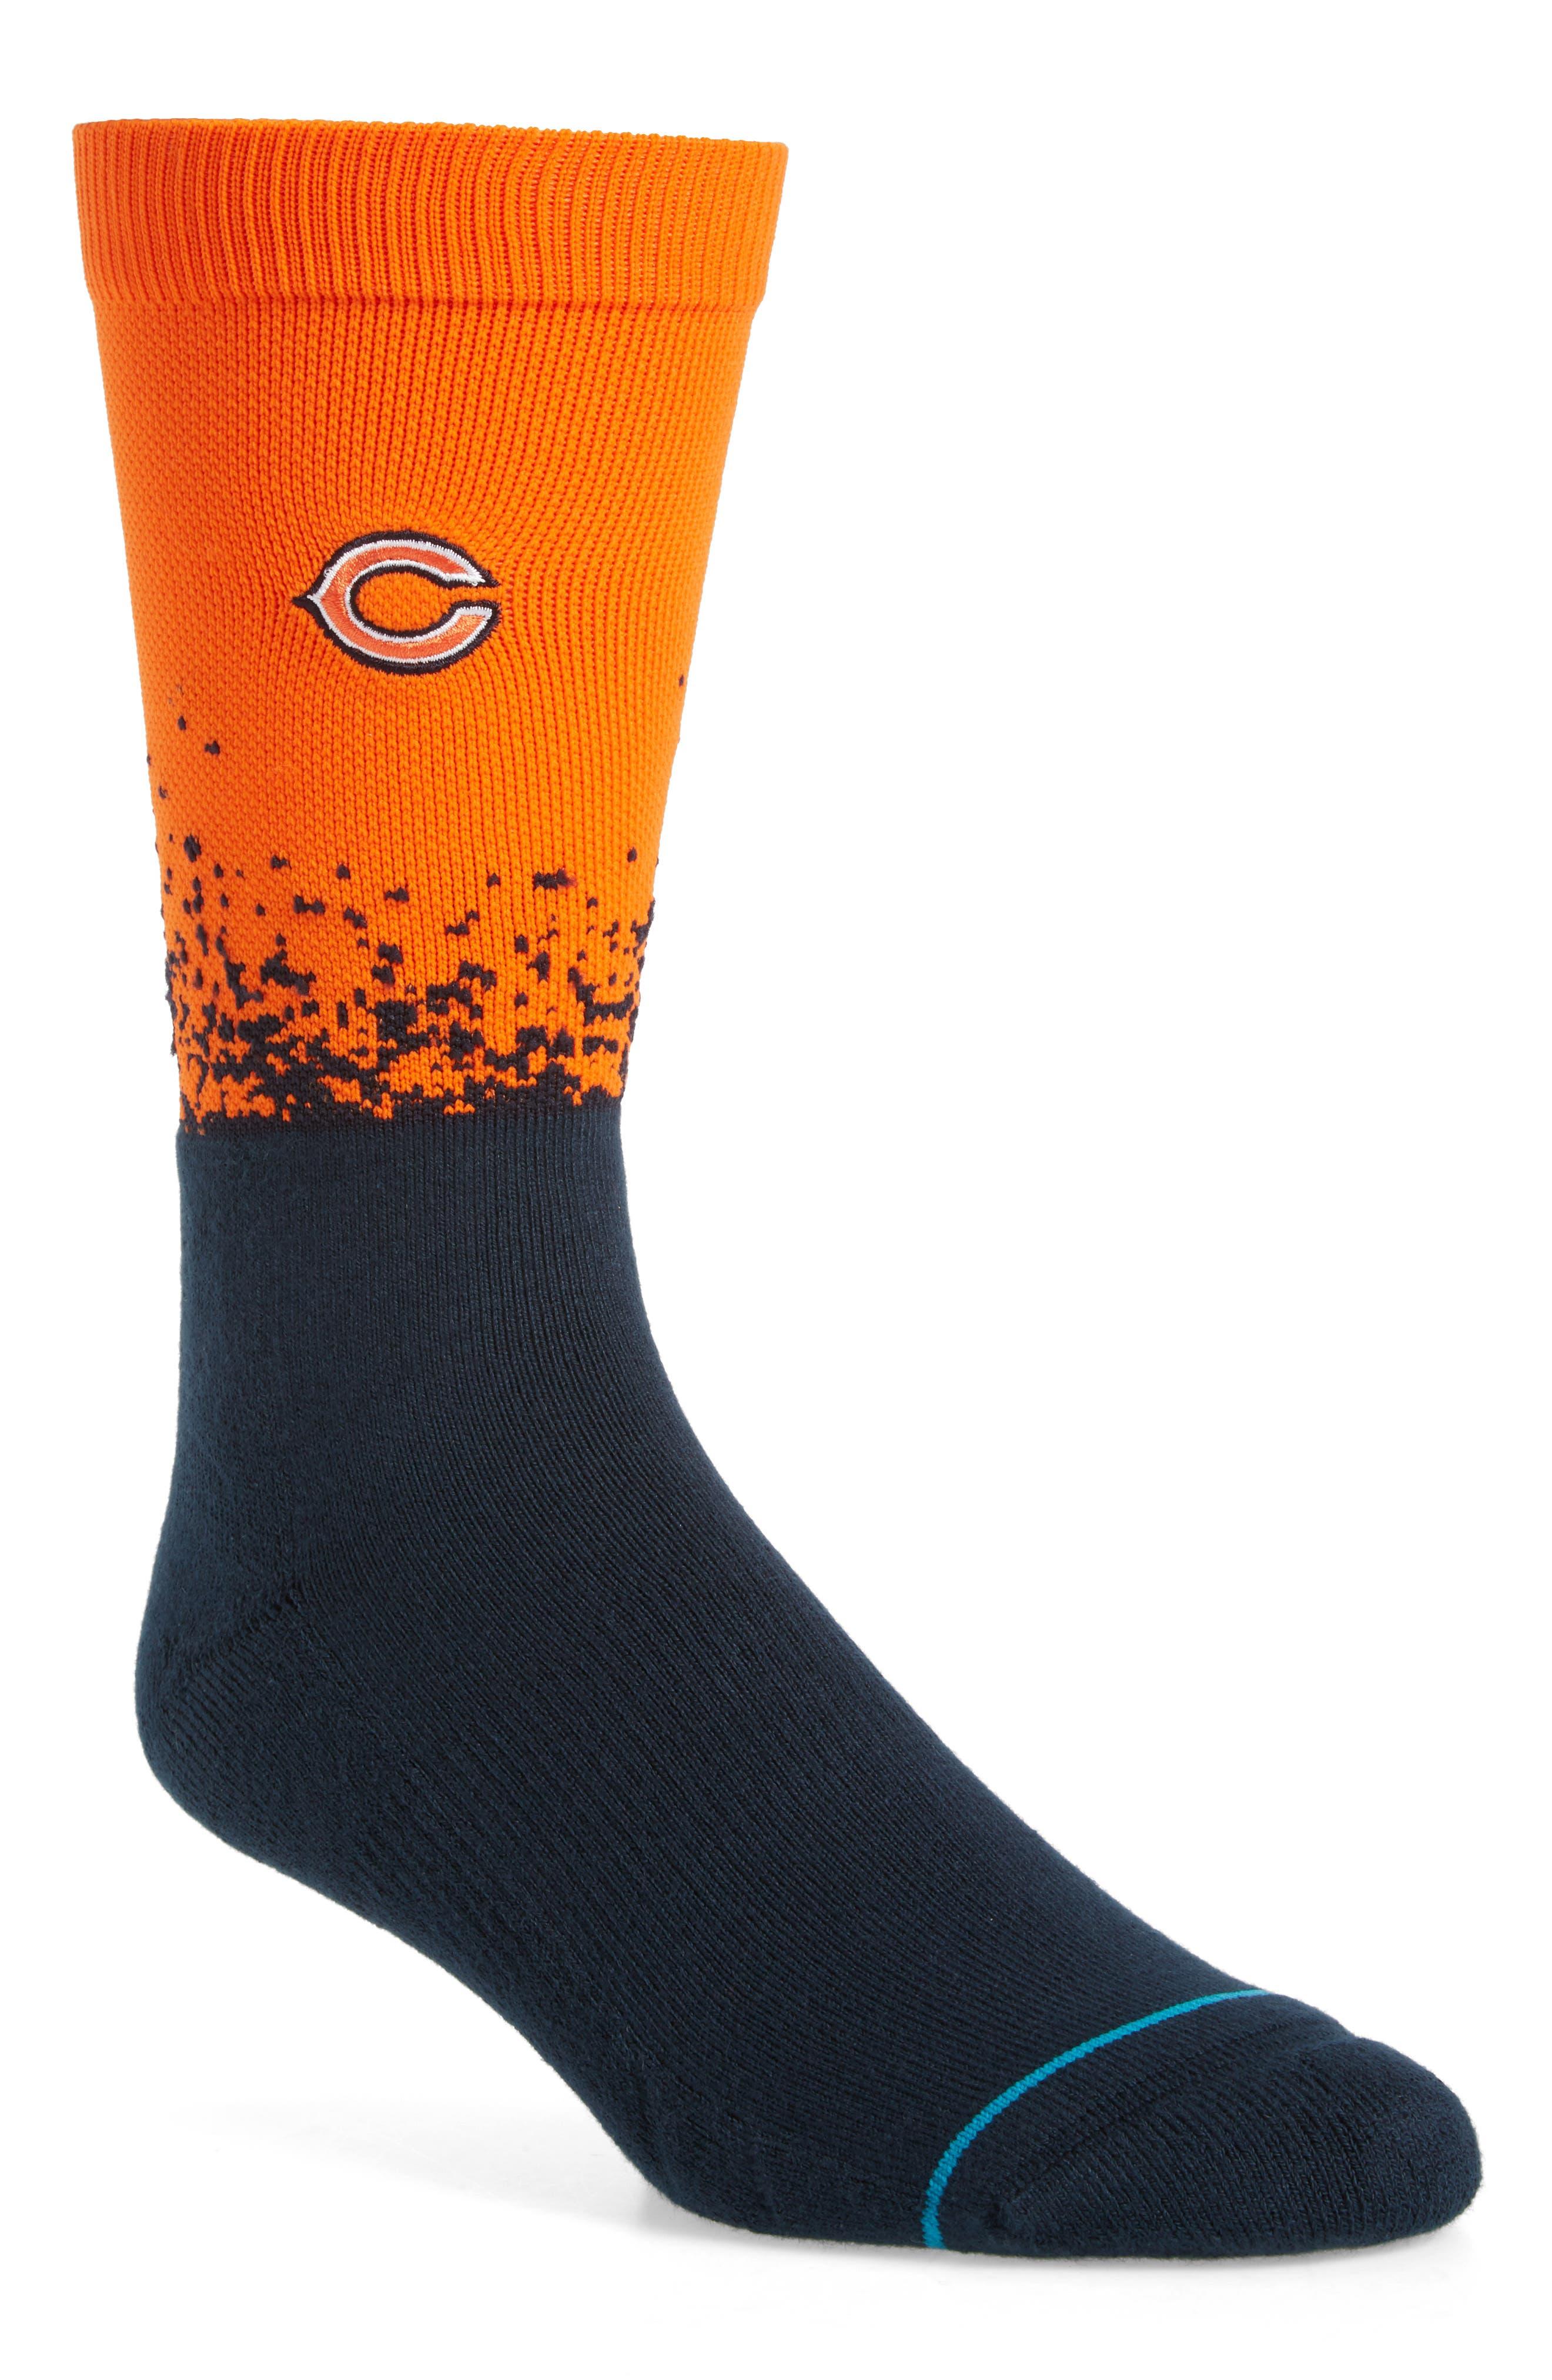 Main Image - Stance Chicago Bears - Fade Socks